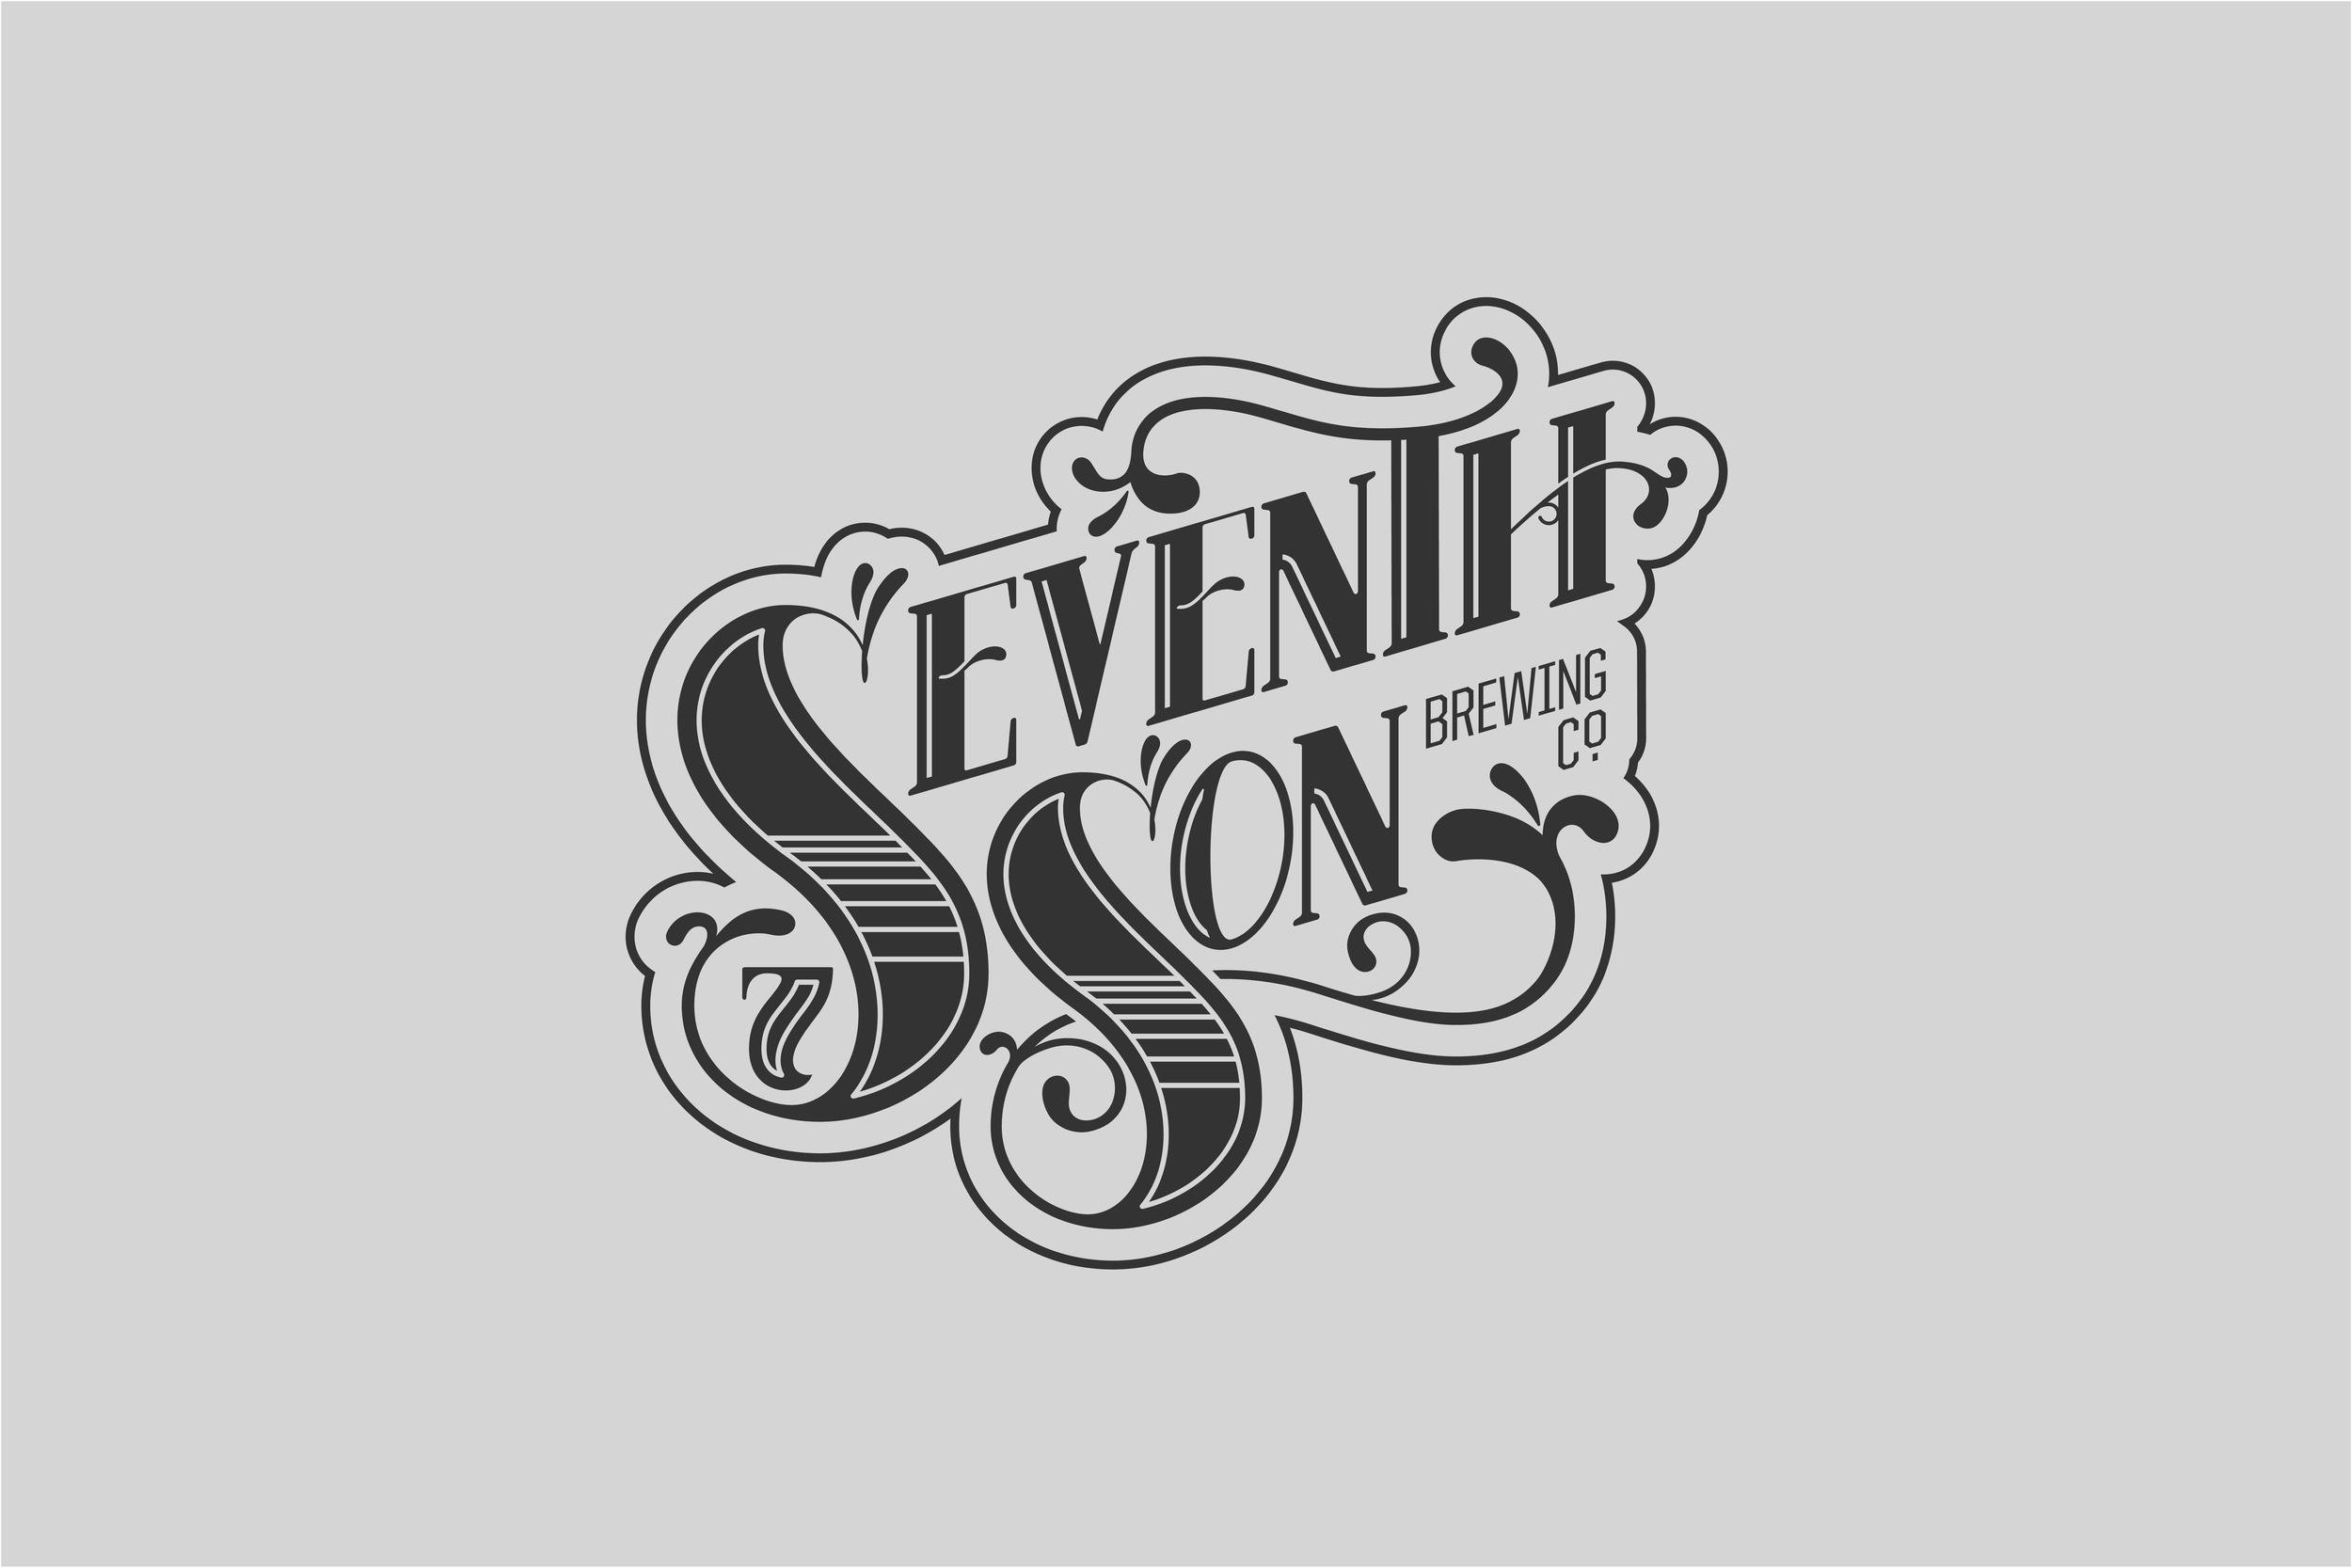 03_SeventhSon.jpg